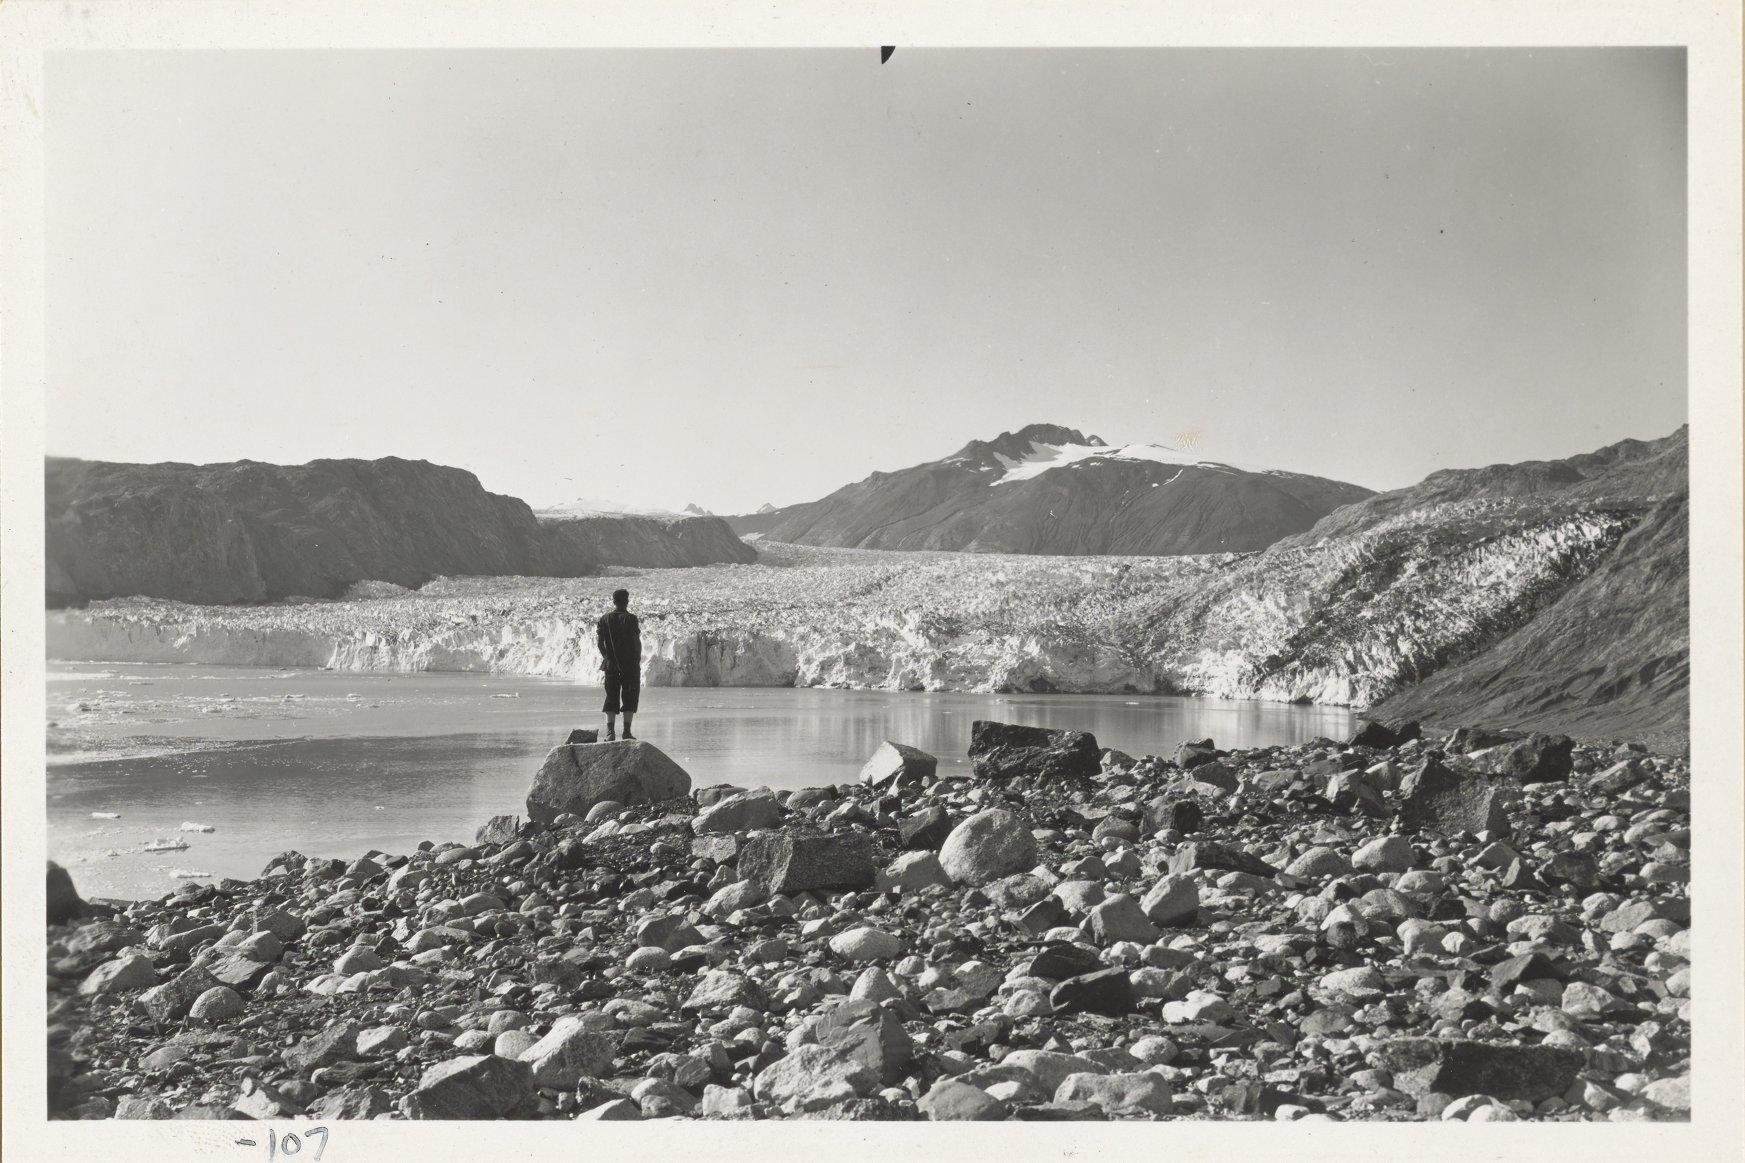 nsidc_glacierPhotos_AGS_F_1941_107